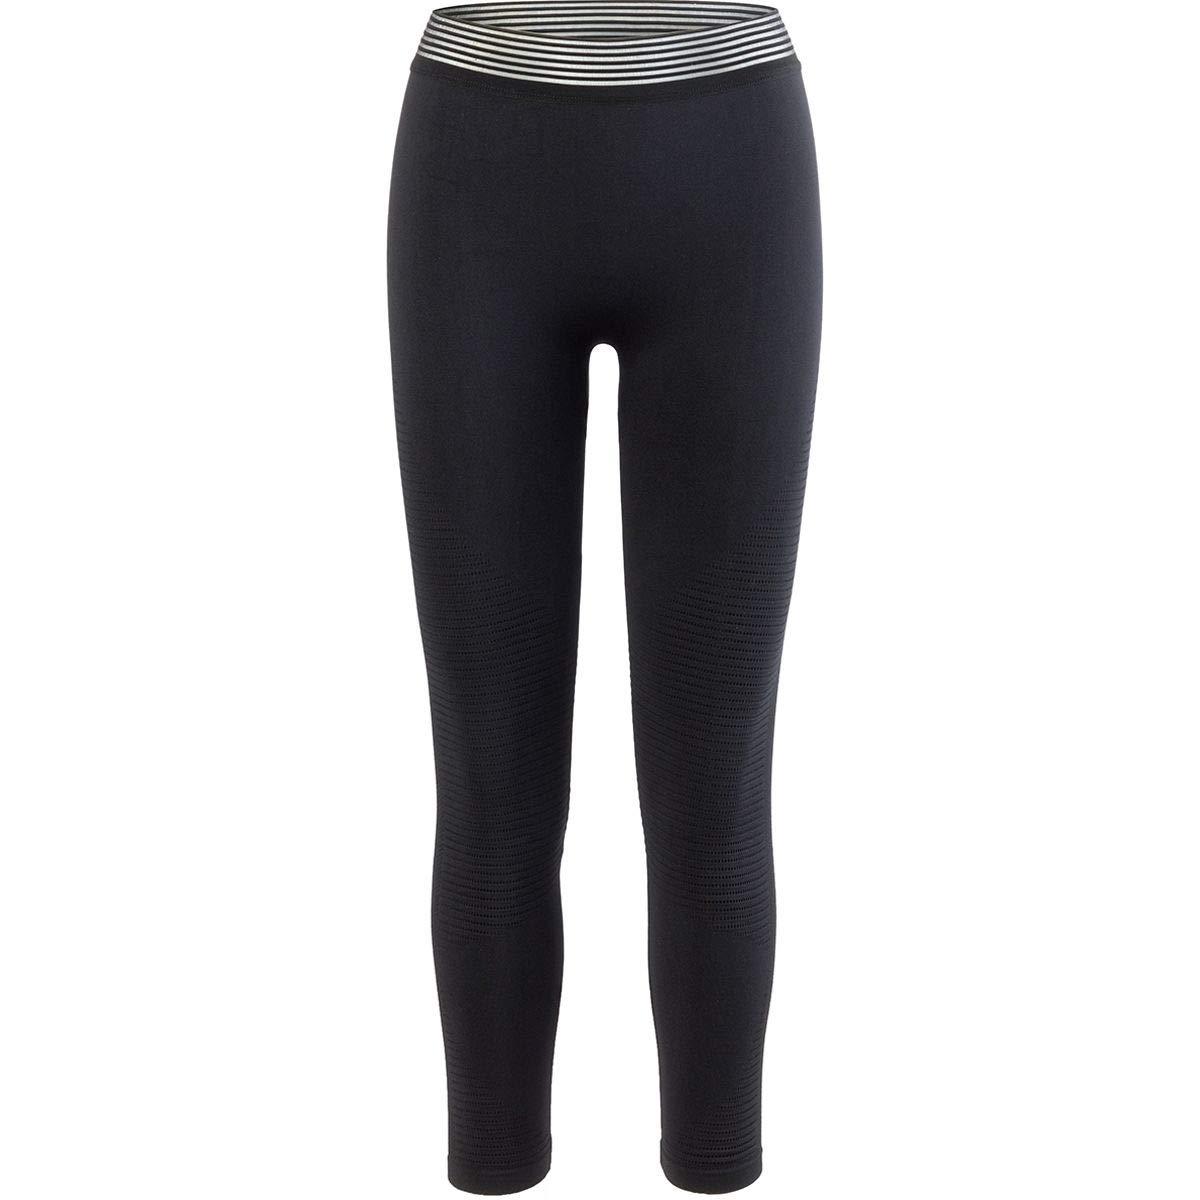 32a9a71b074d4 C&C California Seamless Moto Legging - Women's at Amazon Women's Clothing  store: